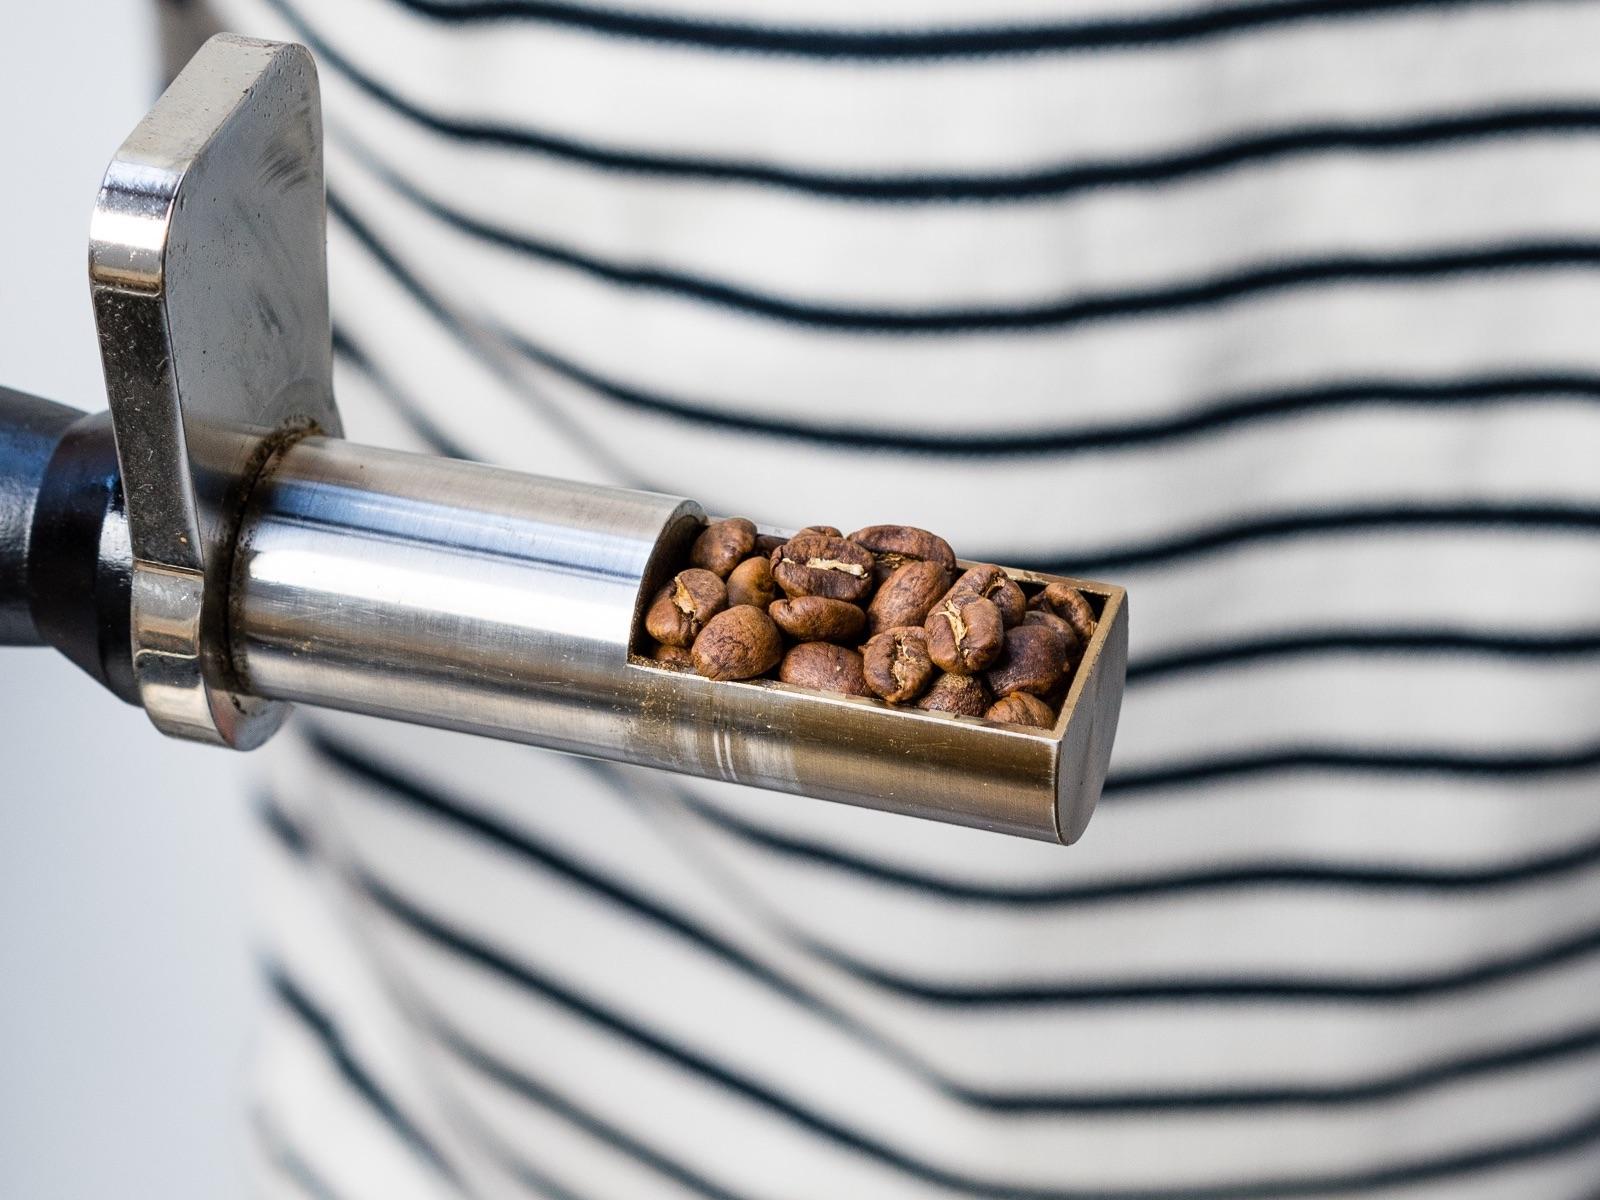 koffiebranden gent koffie bonen koffiebranderij